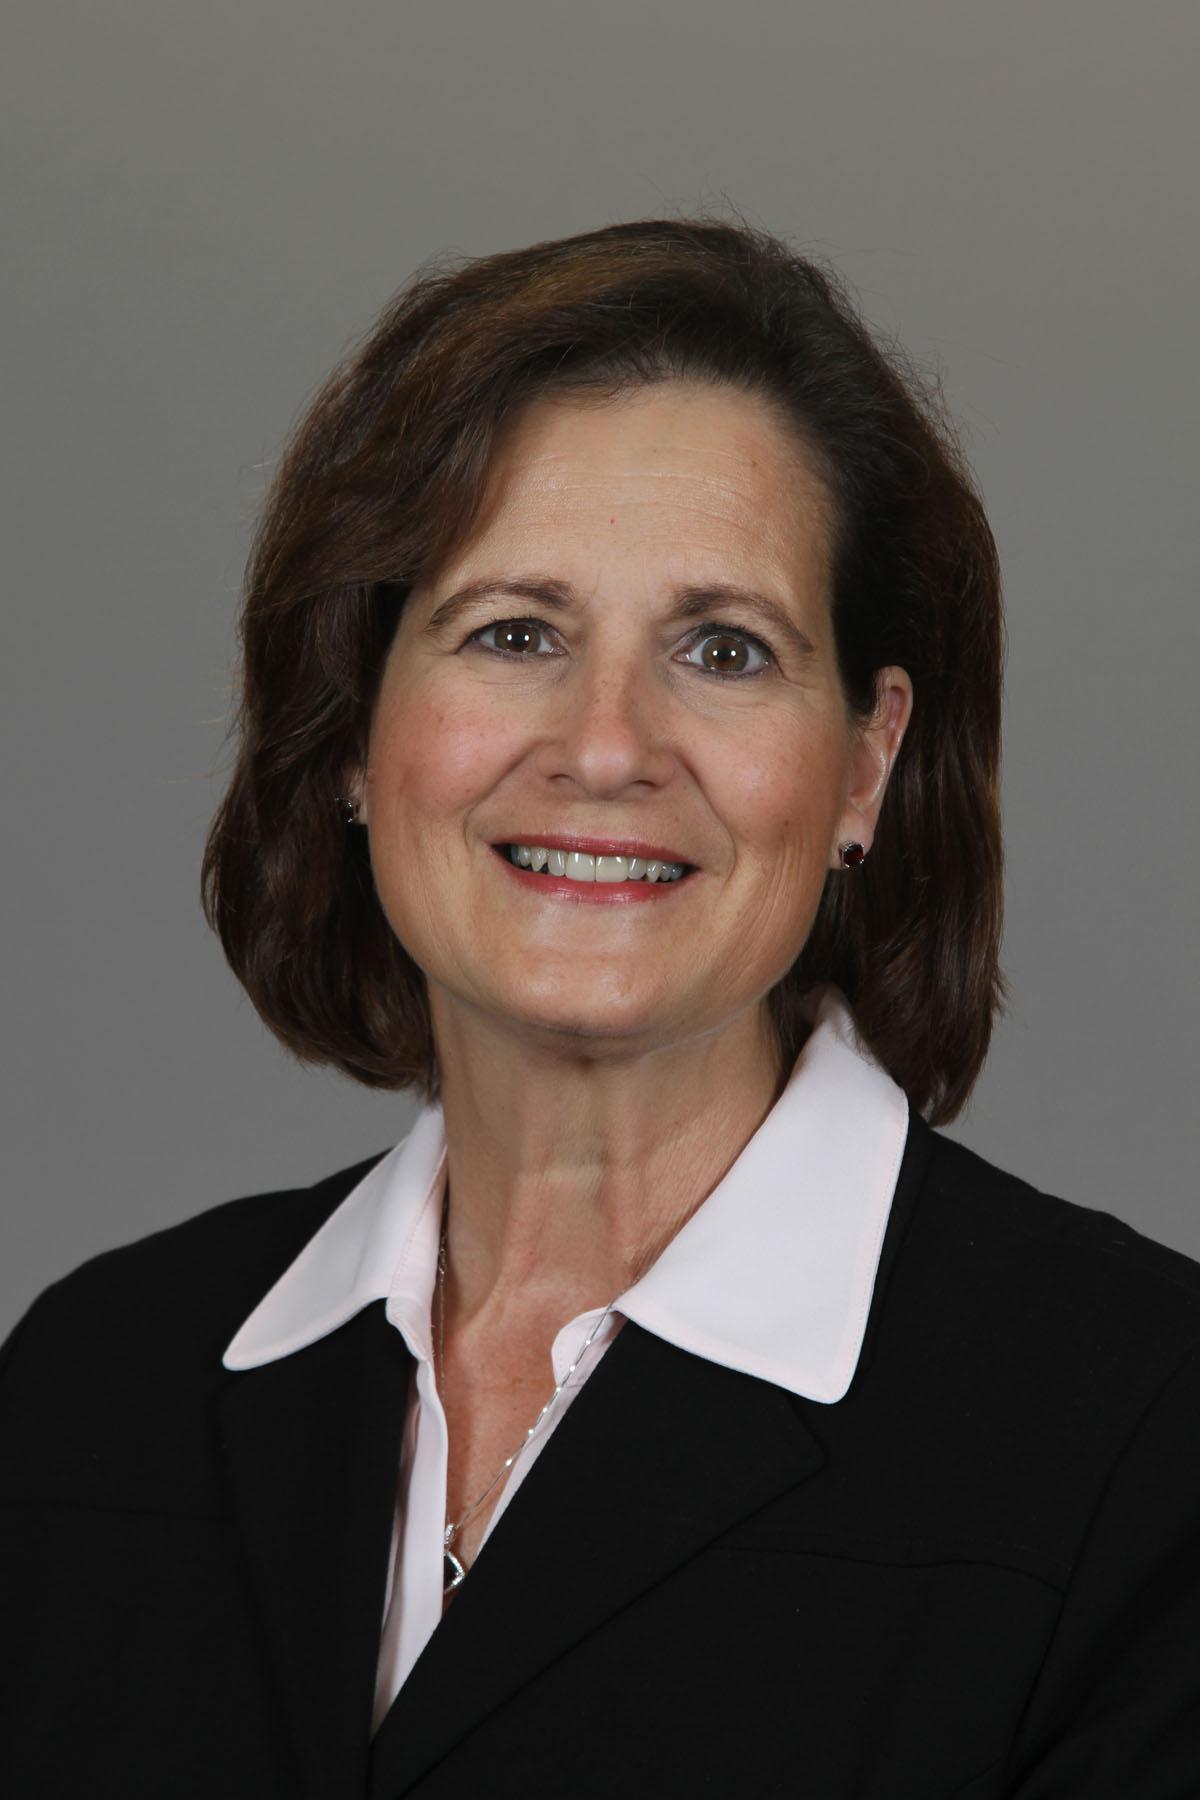 Laura Callahan Portrait Photo